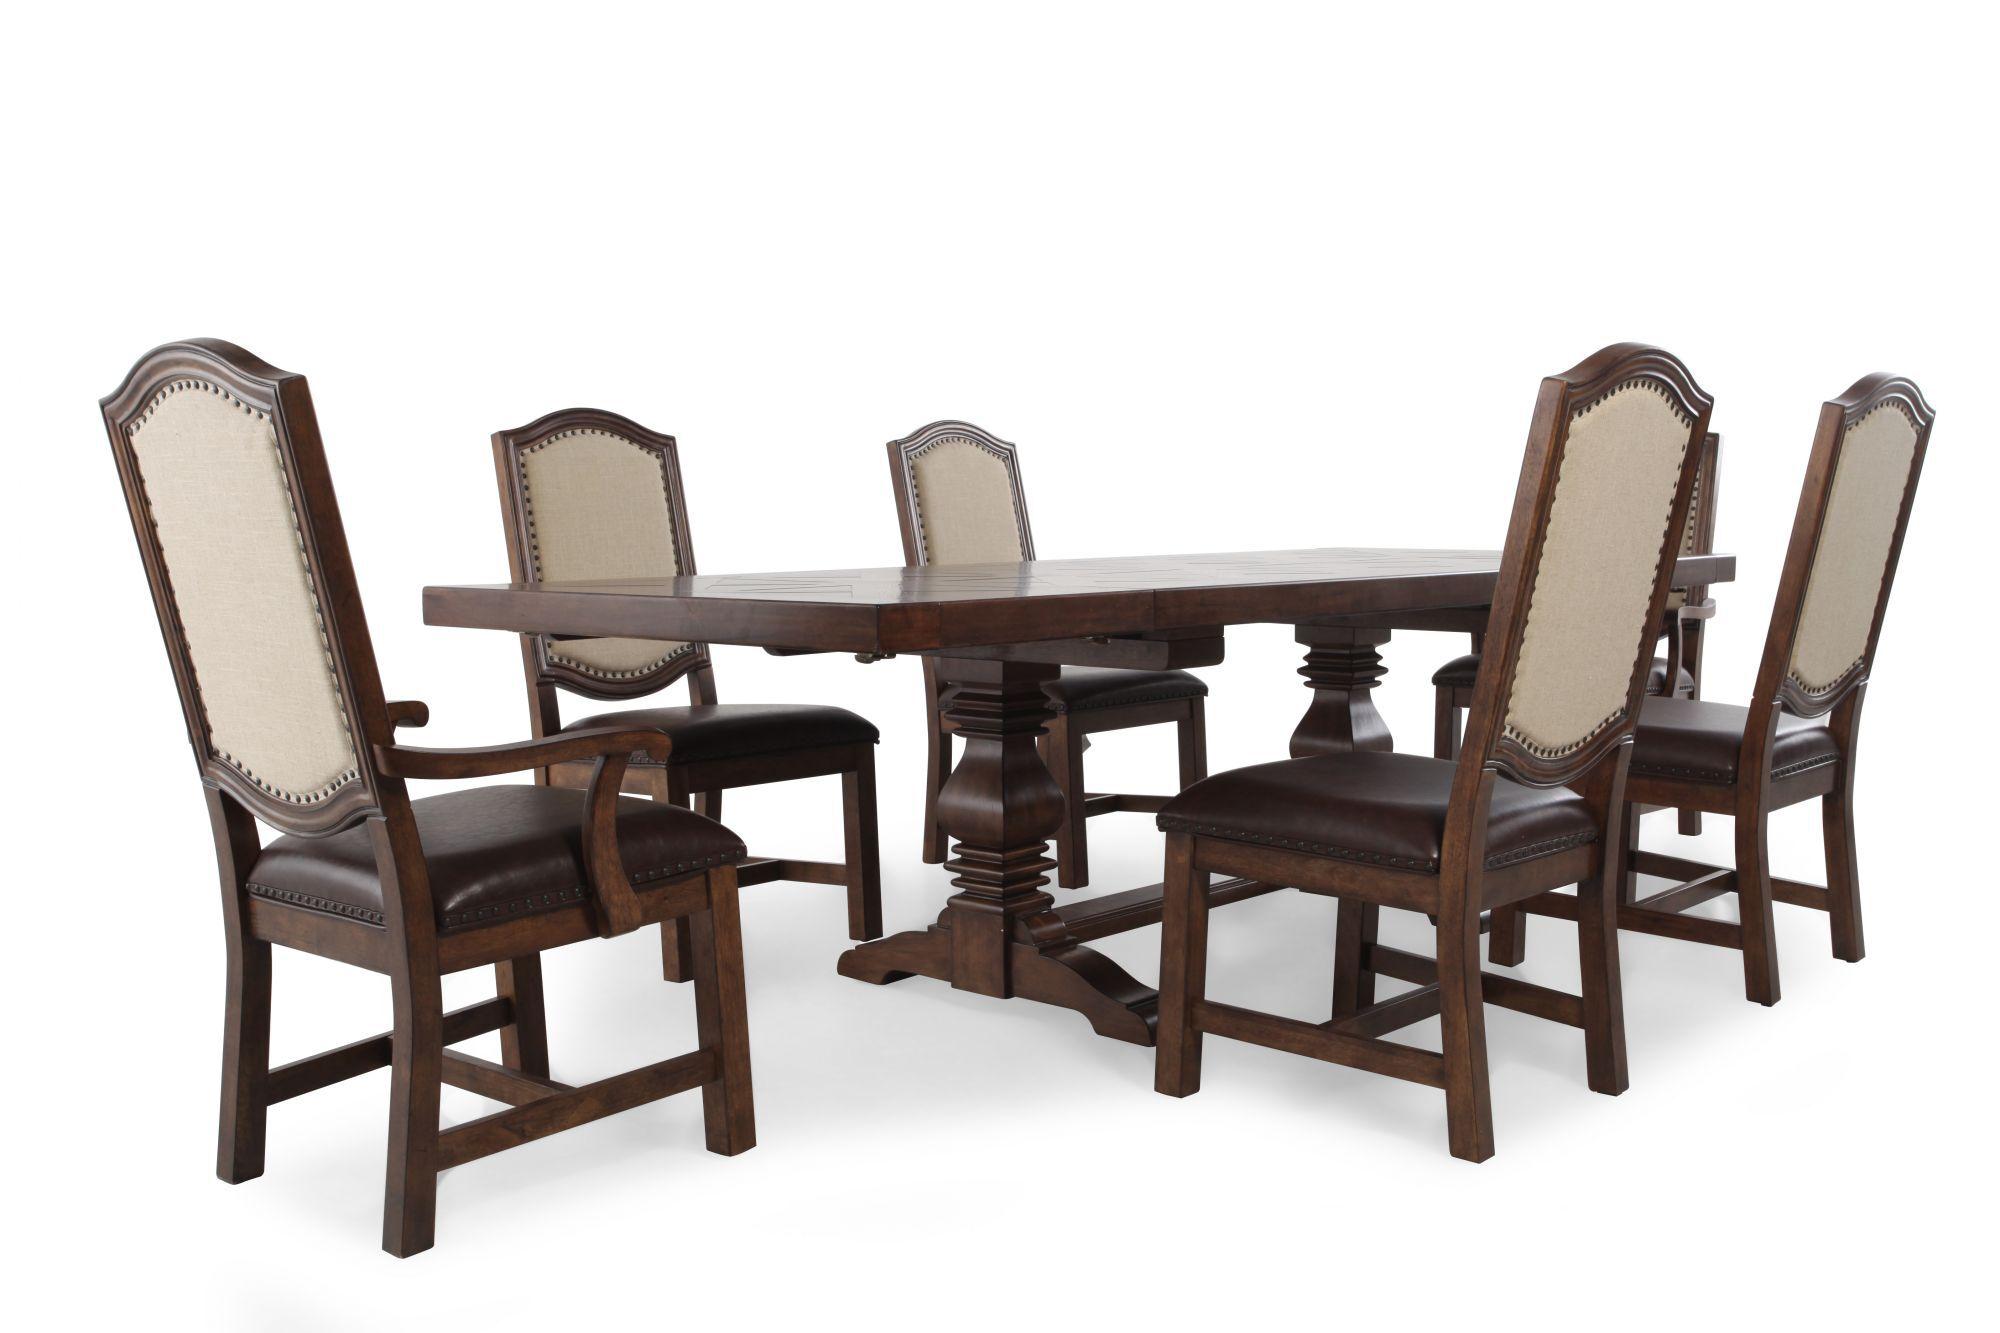 Samuel Lawrence American Attitude Seven Piece Dining Table